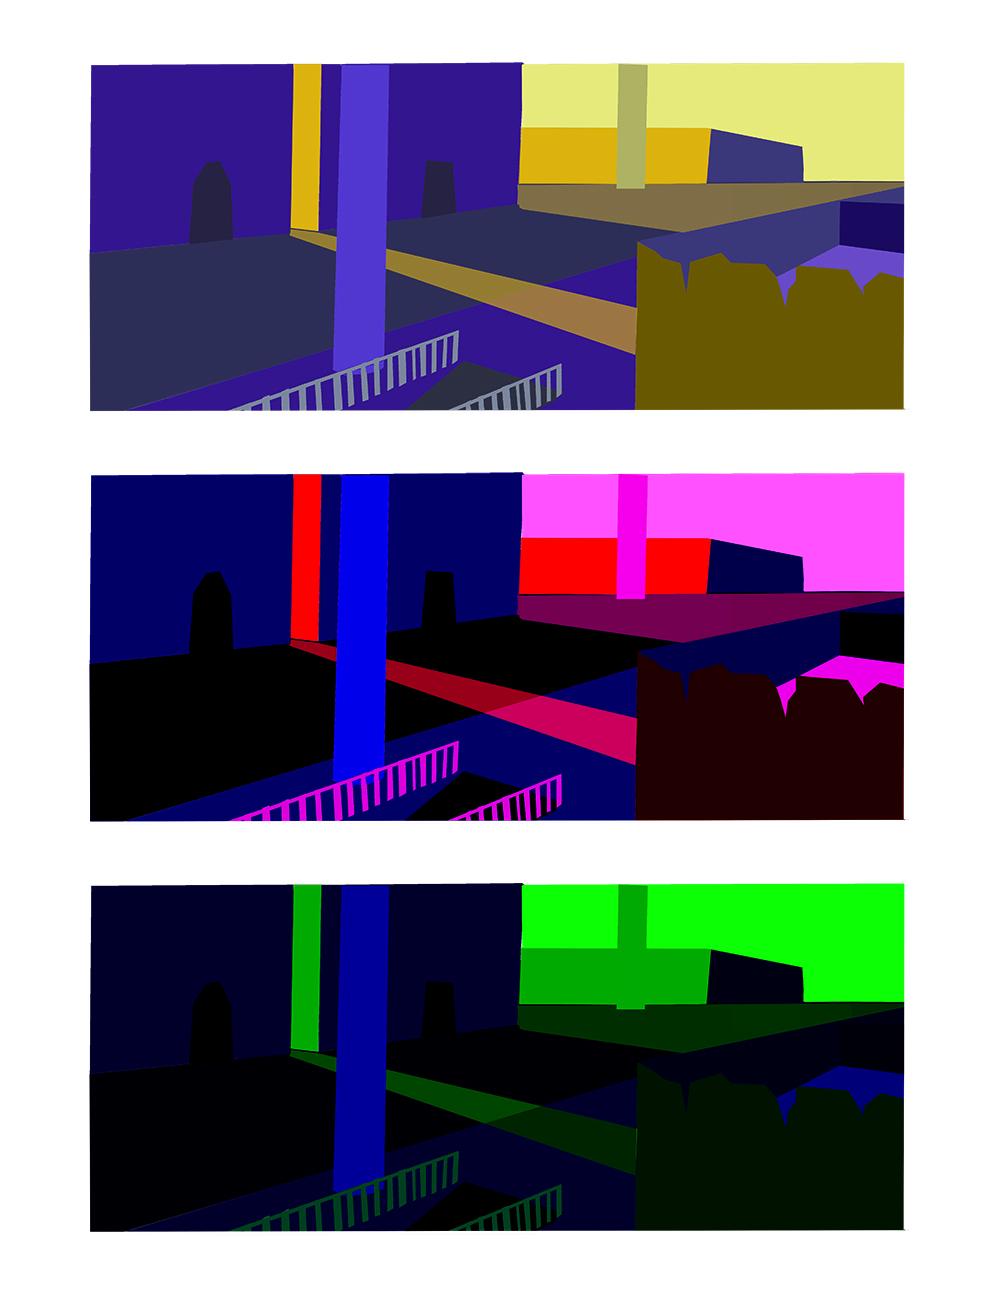 Environmental Color Study